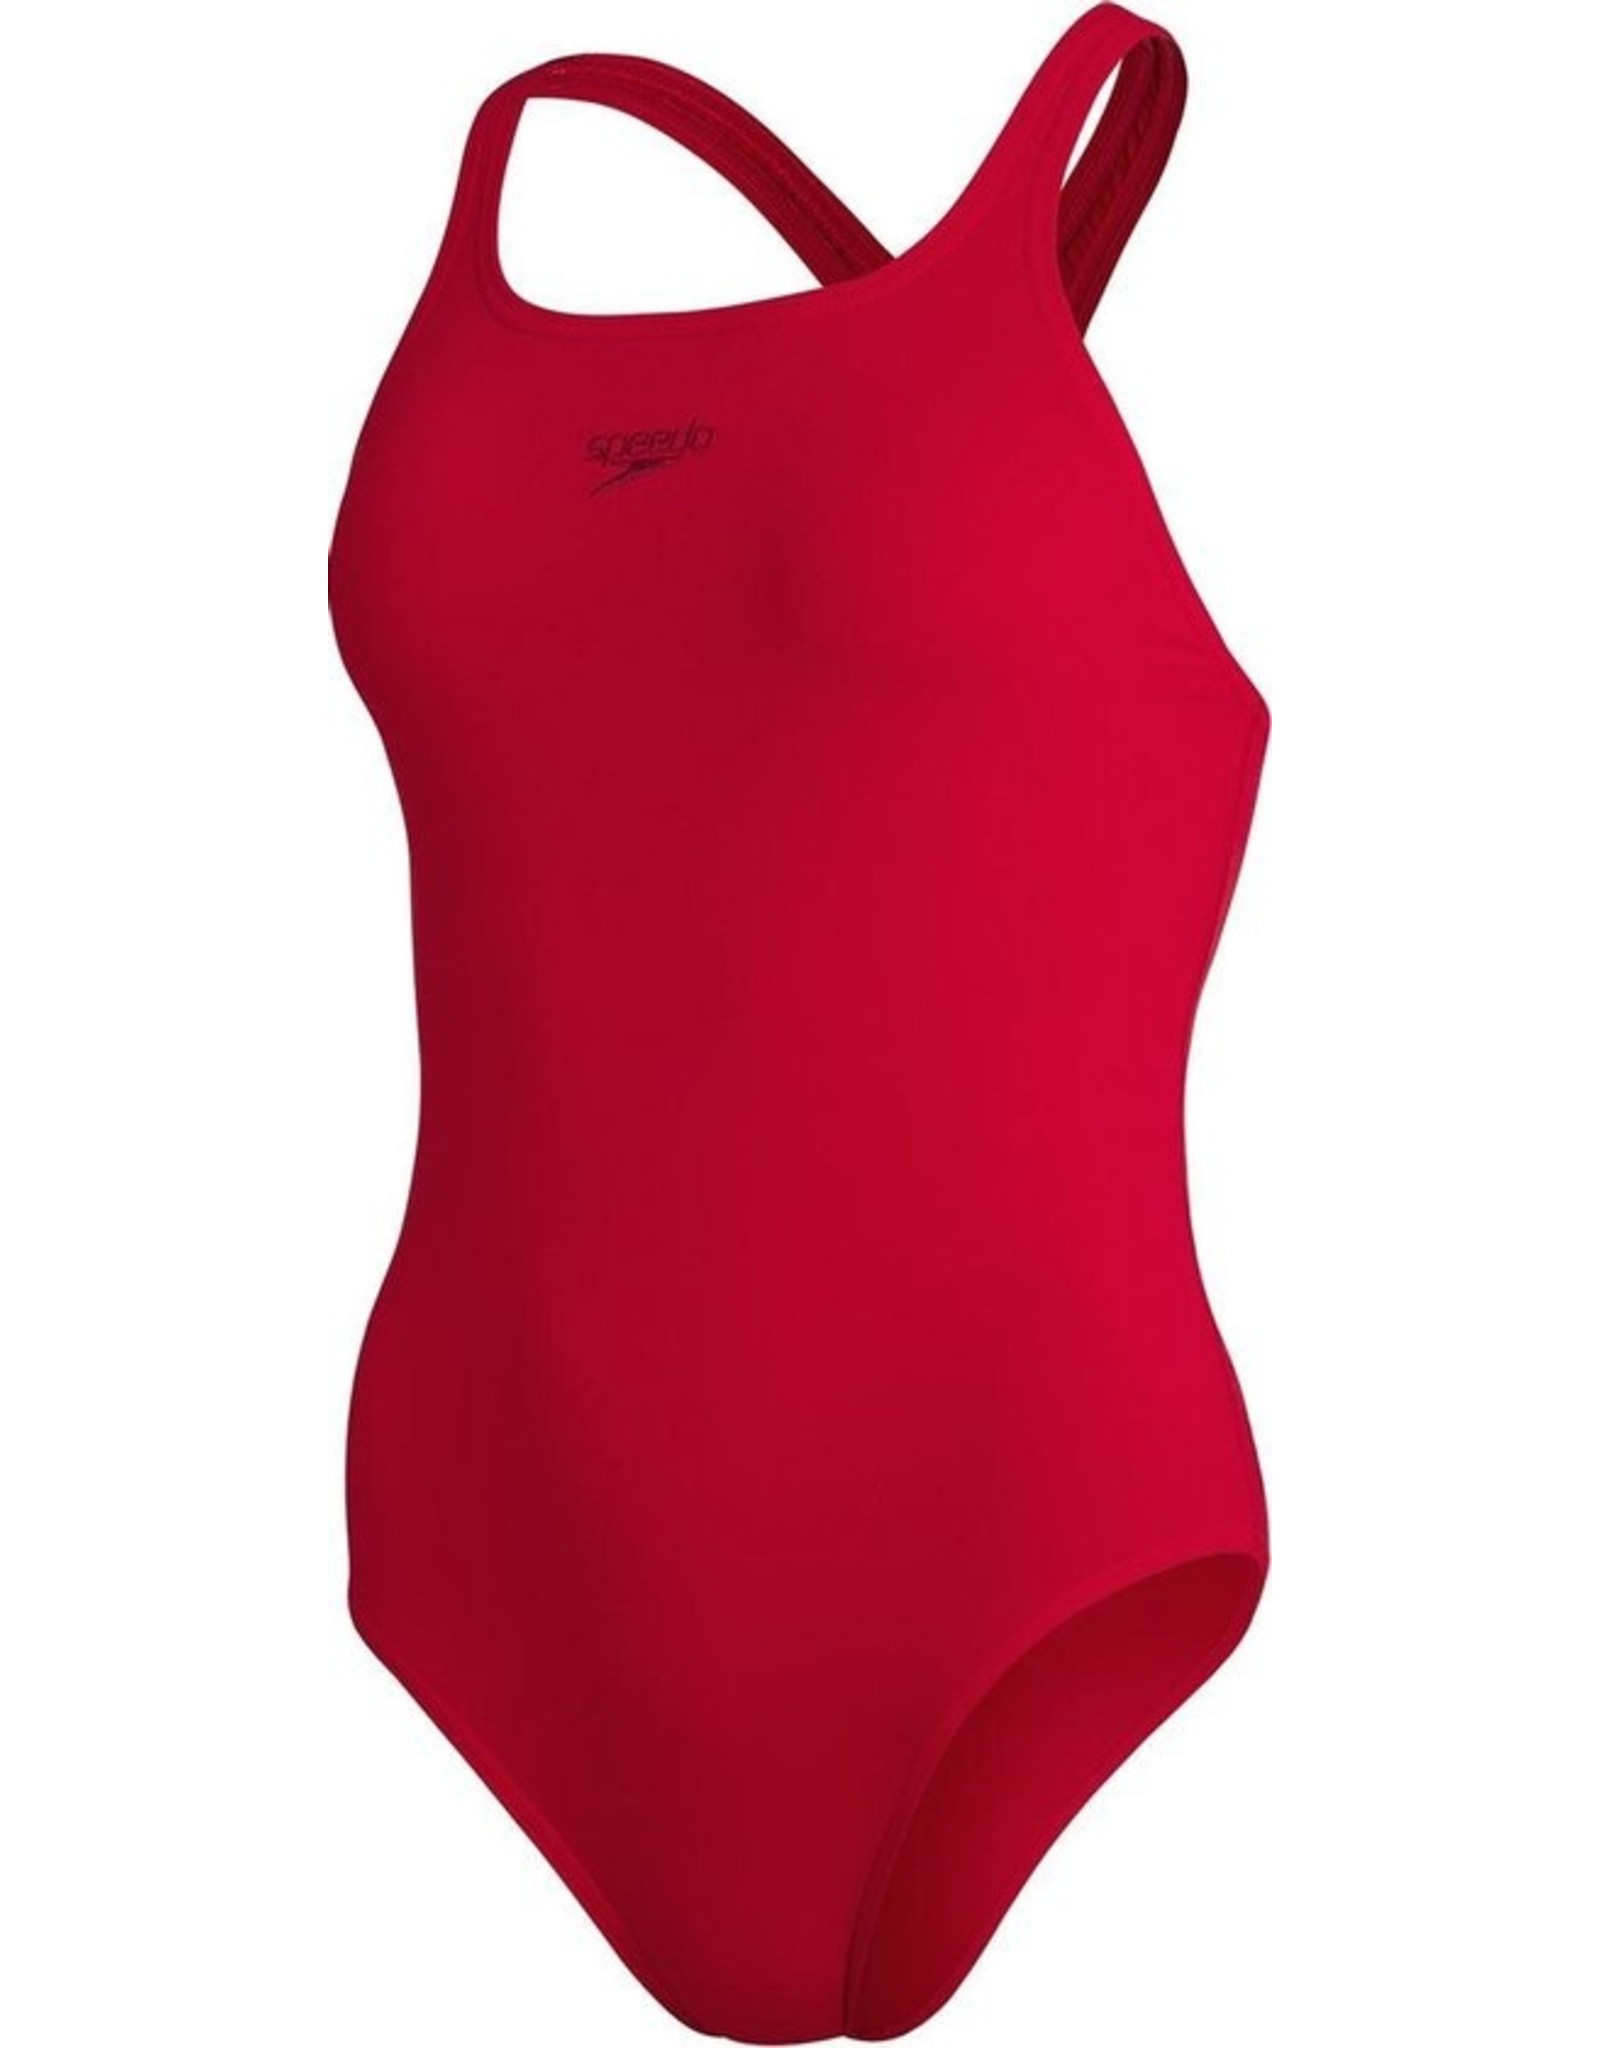 Speedo W Pool Essential End Medalist - Red